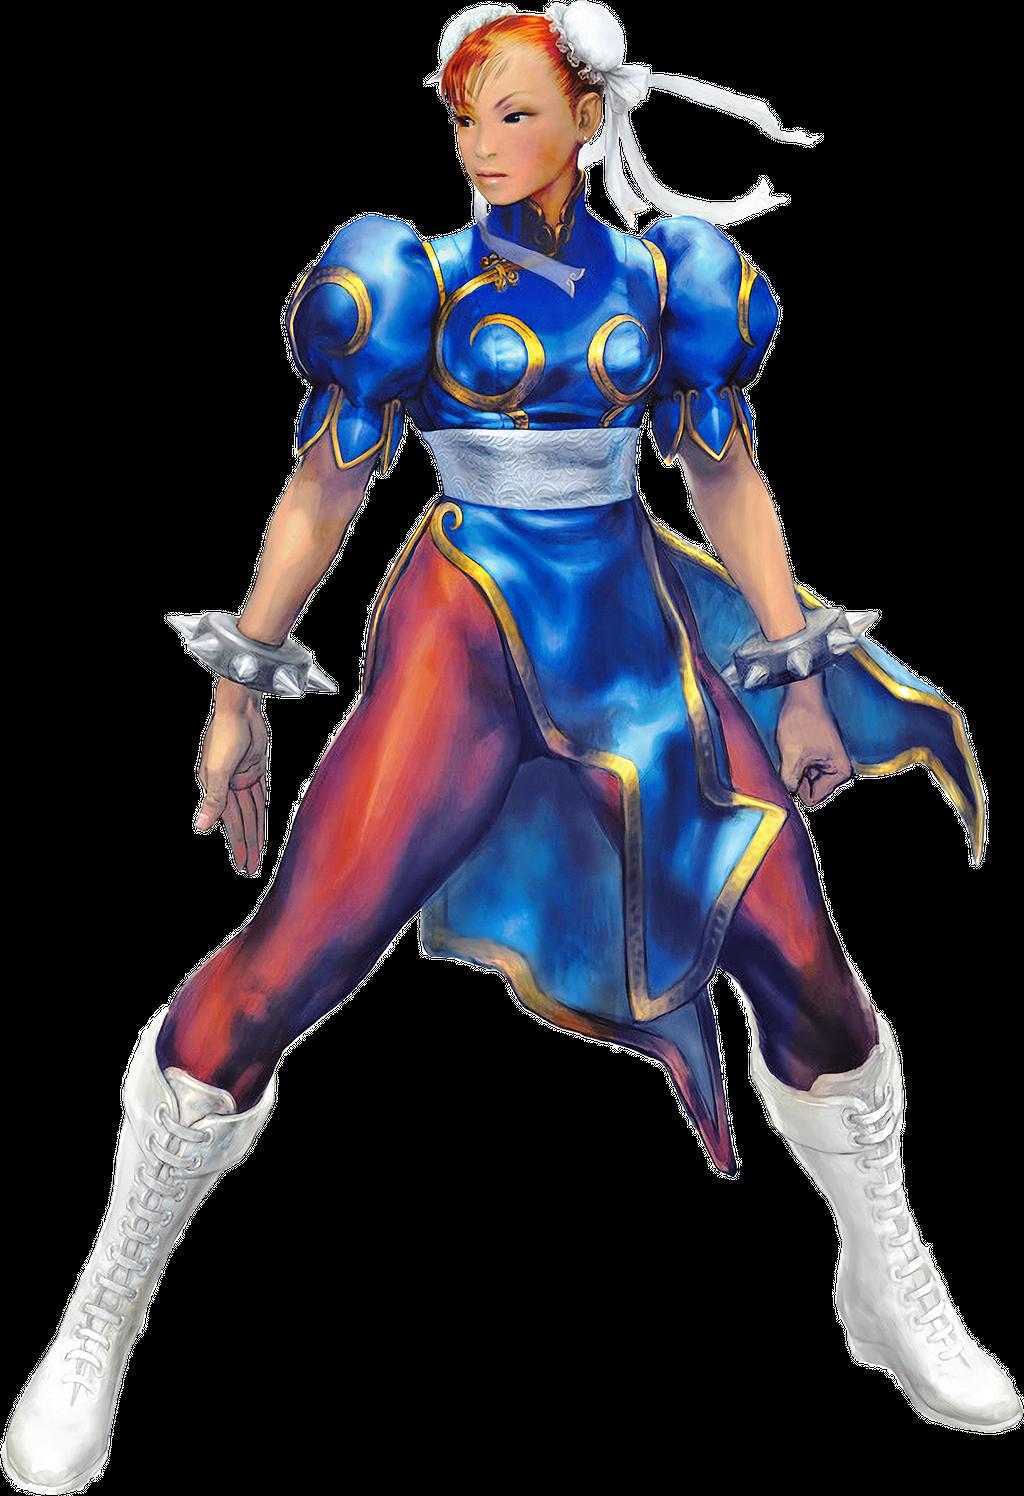 Chun Li Street Fighter Artwork Page 2